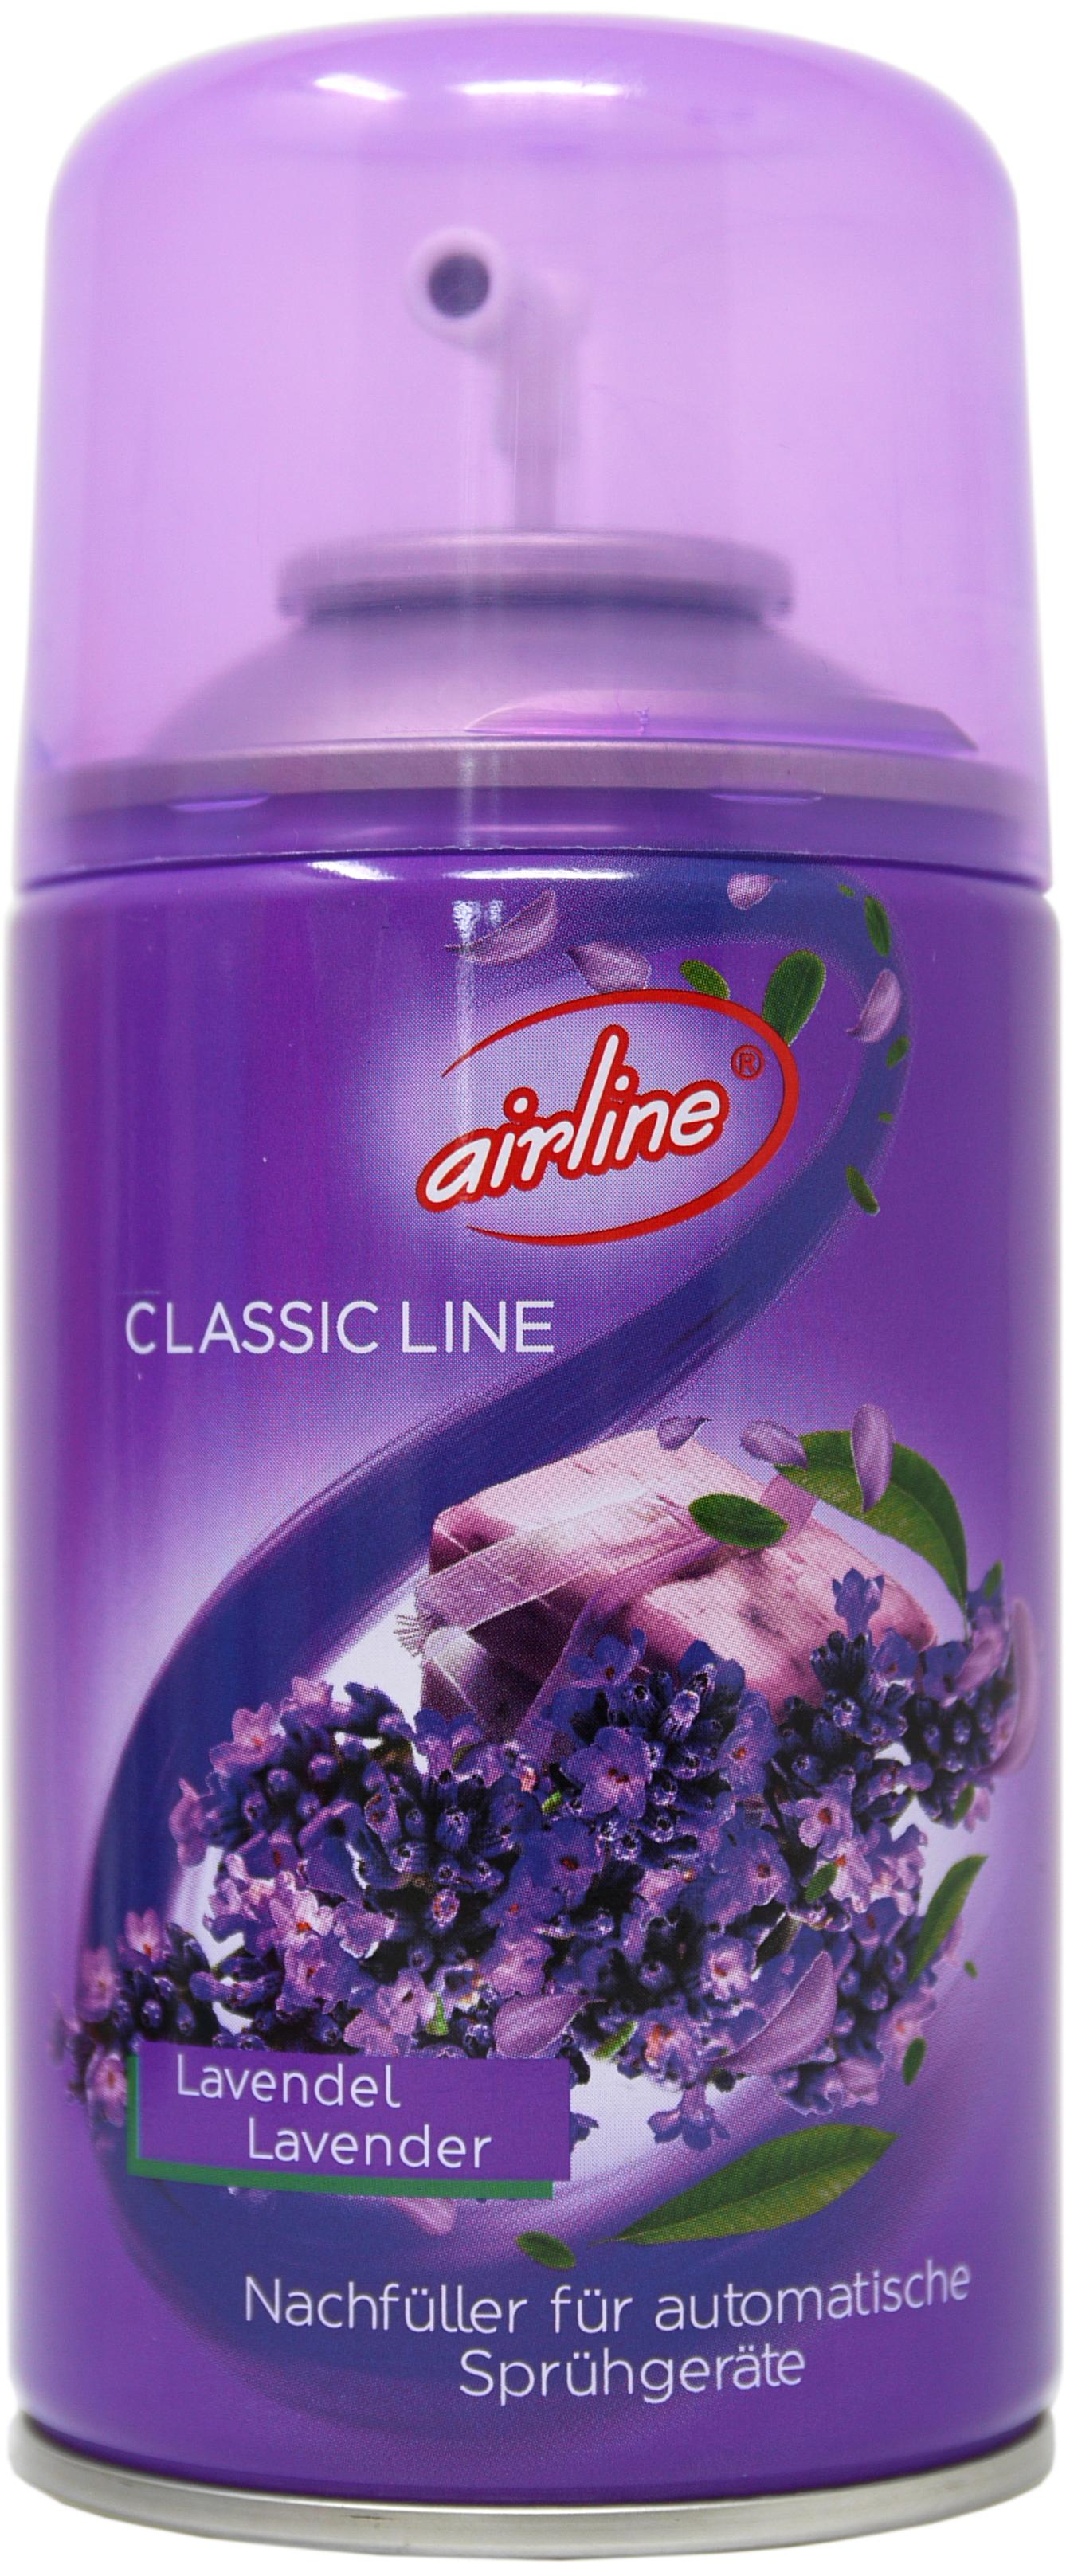 00504 - airline Classic Line Lavendel Nachfüllkartusche 250 ml